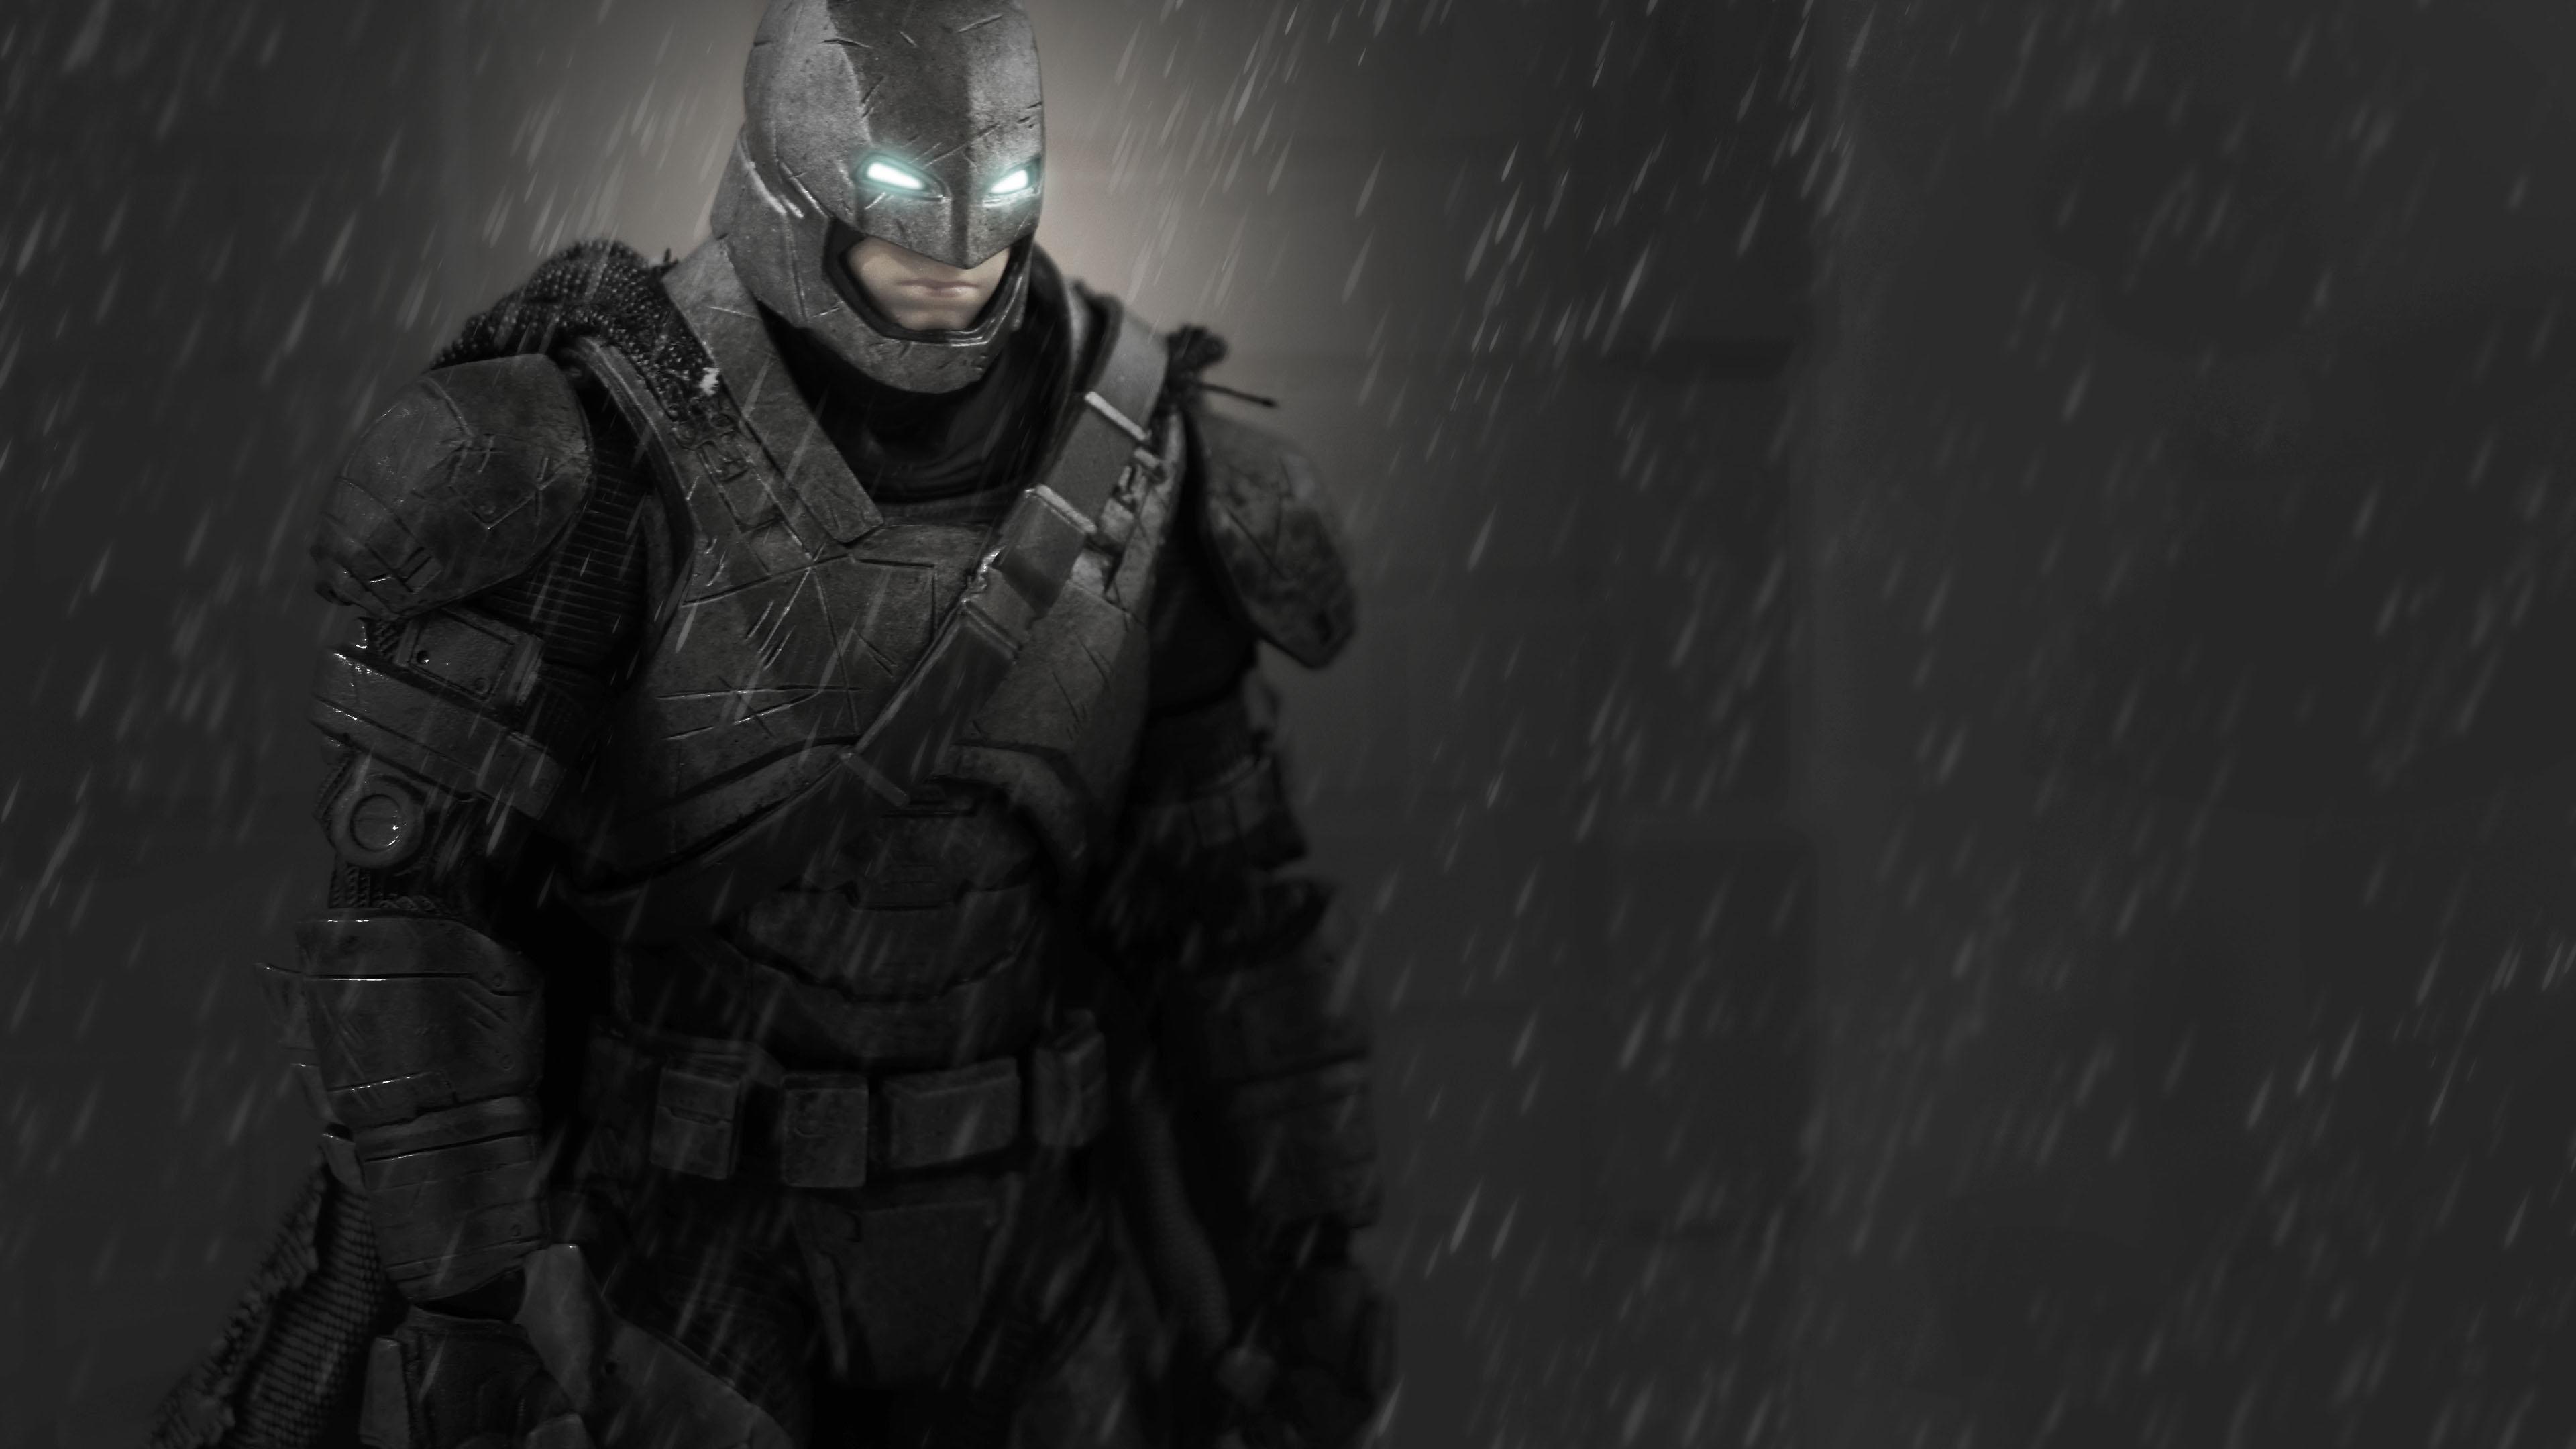 4k batman new 2019 1560533670 - 4k Batman New 2019 - superheroes wallpapers, hd-wallpapers, digital art wallpapers, behance wallpapers, batman wallpapers, artwork wallpapers, 4k-wallpapers